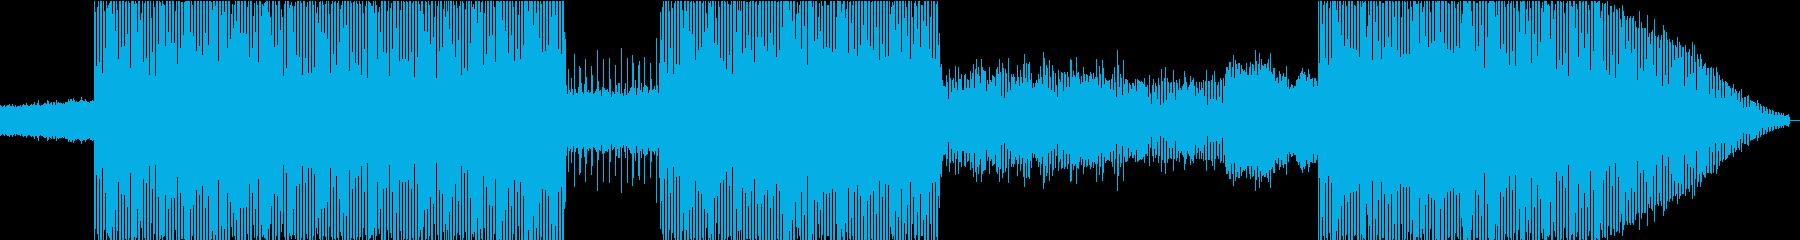 EDMアレンジによるハードロックの再生済みの波形